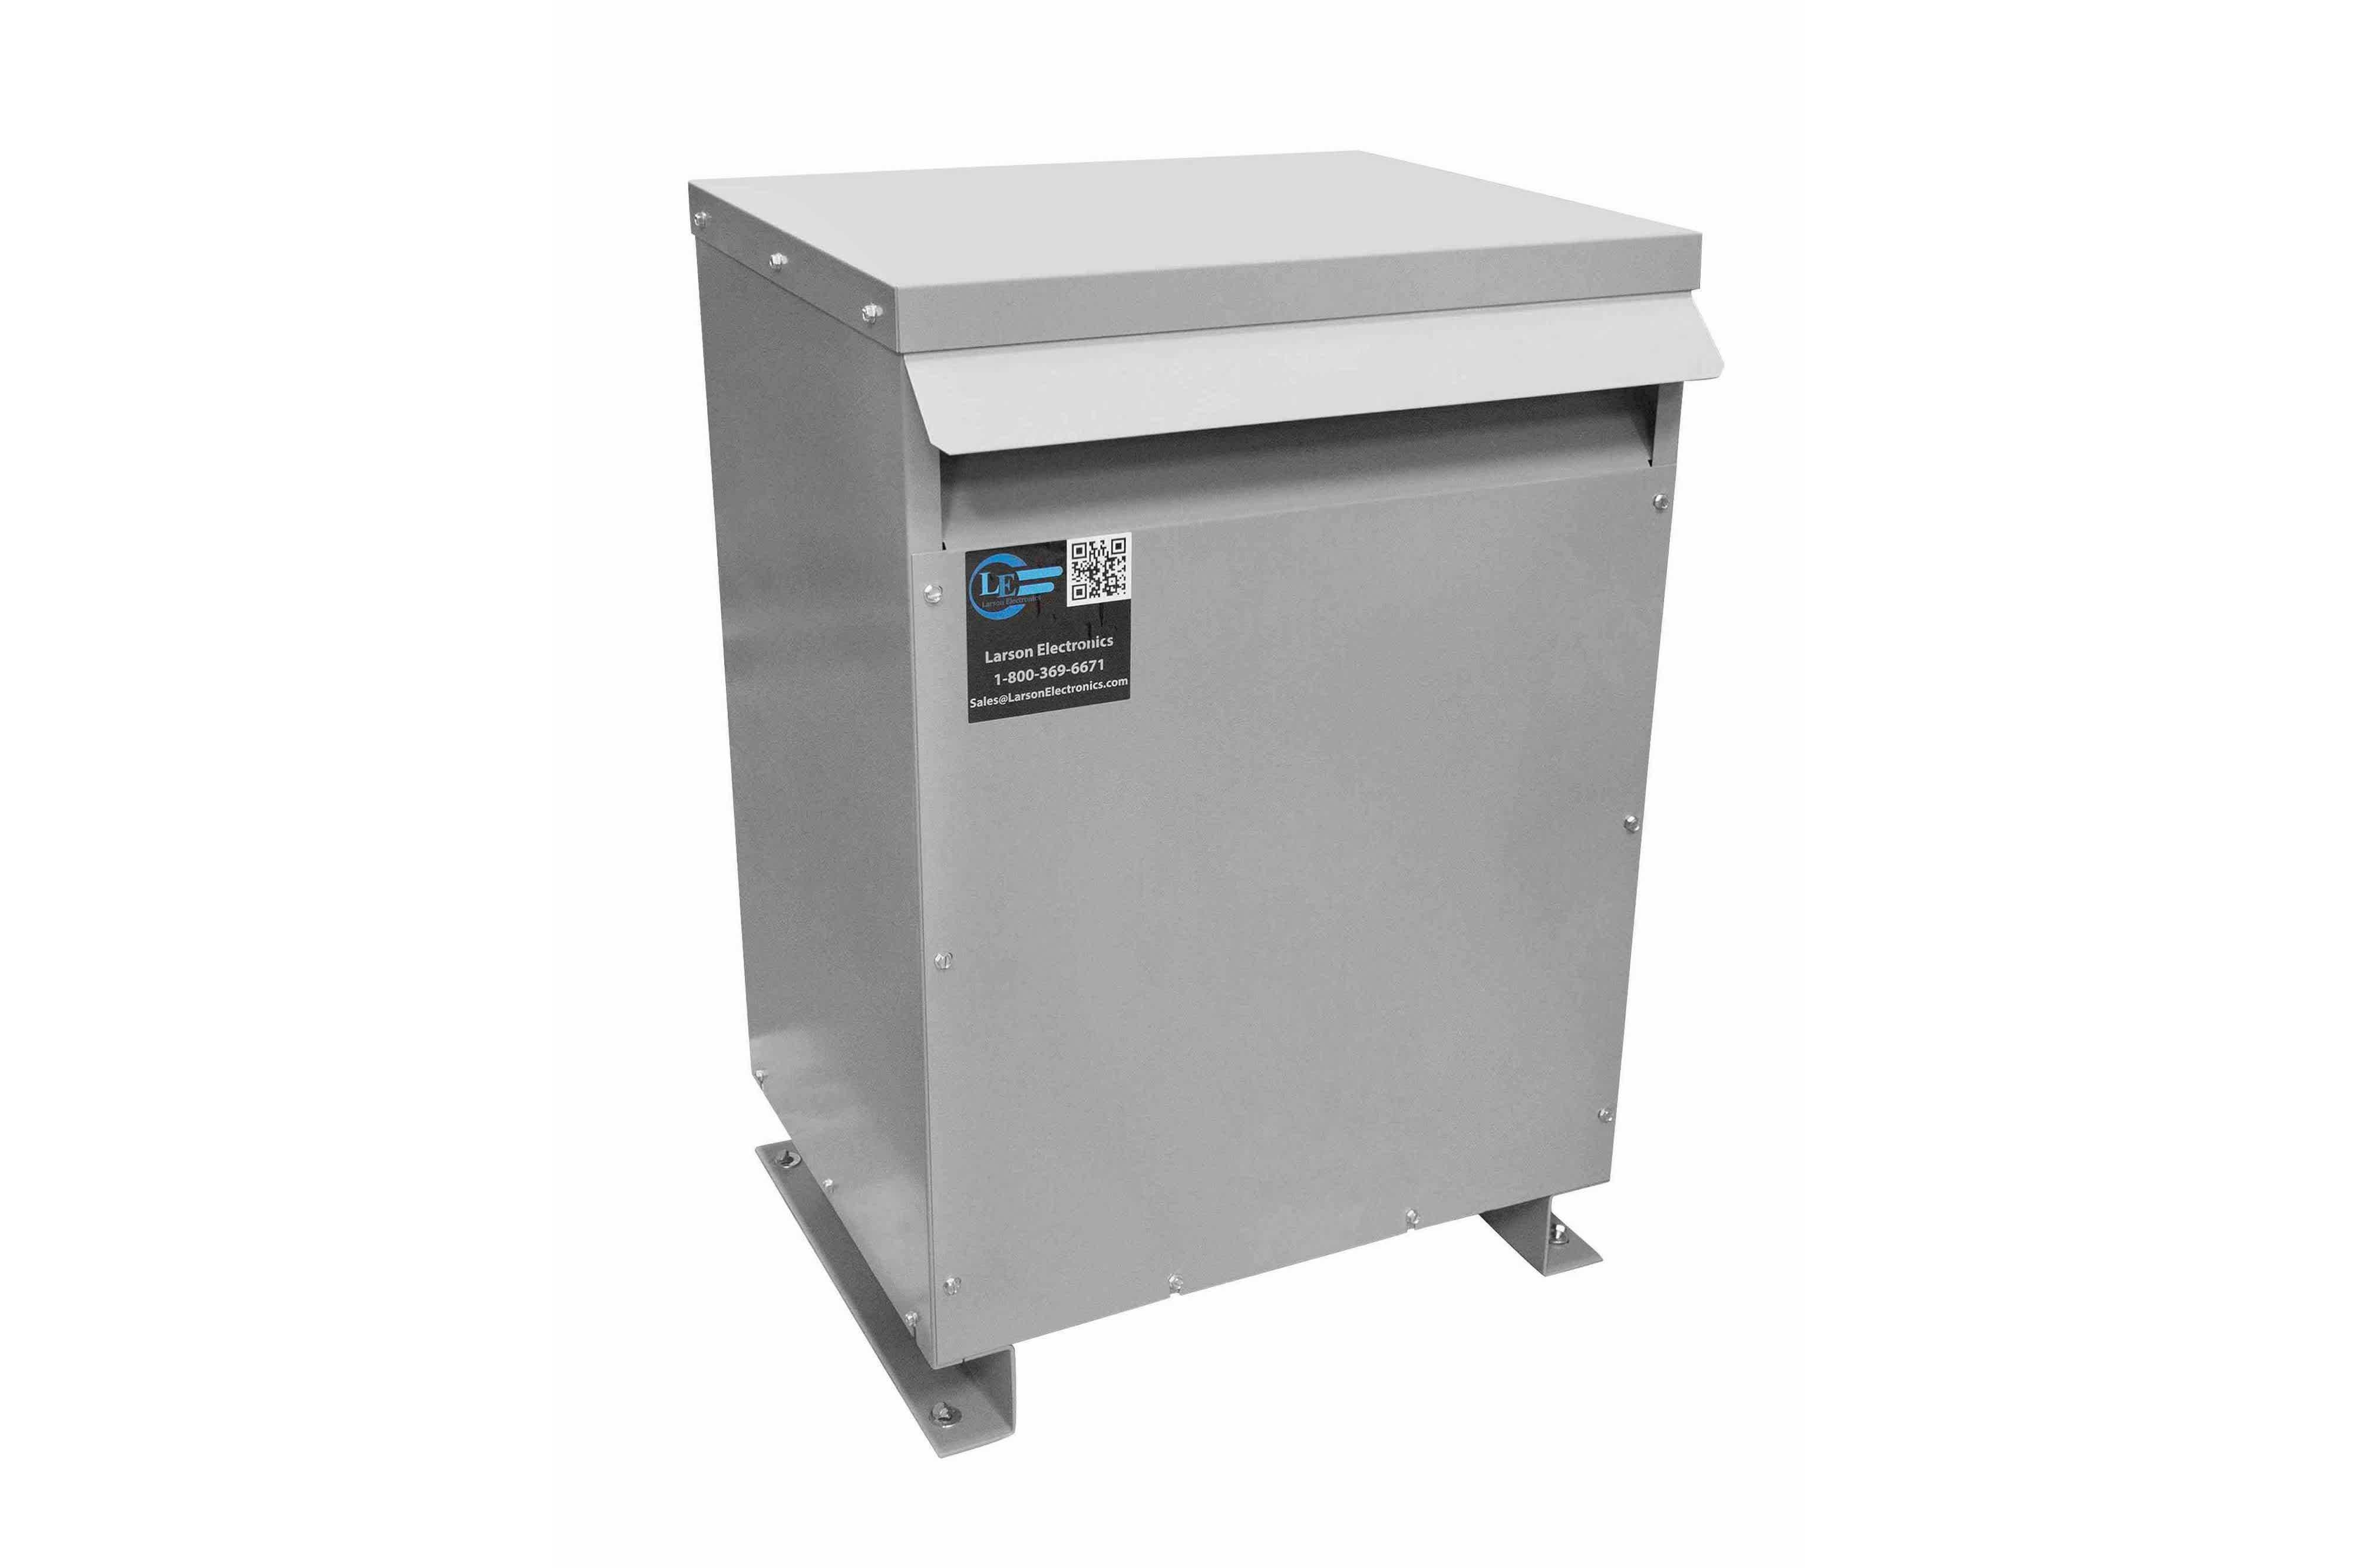 200 kVA 3PH DOE Transformer, 240V Delta Primary, 480Y/277 Wye-N Secondary, N3R, Ventilated, 60 Hz